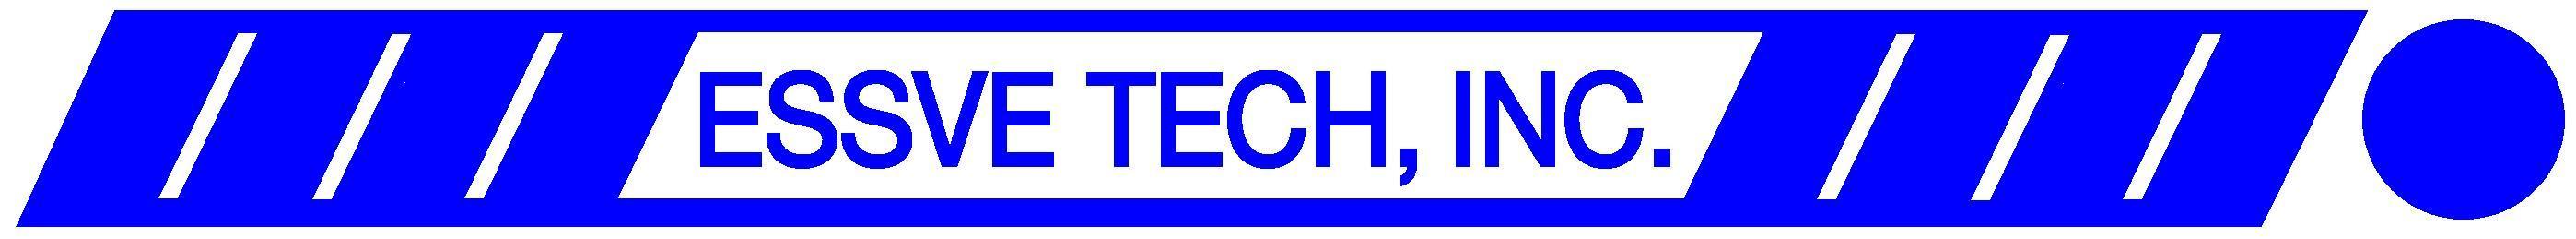 EssVe Tech, Inc.